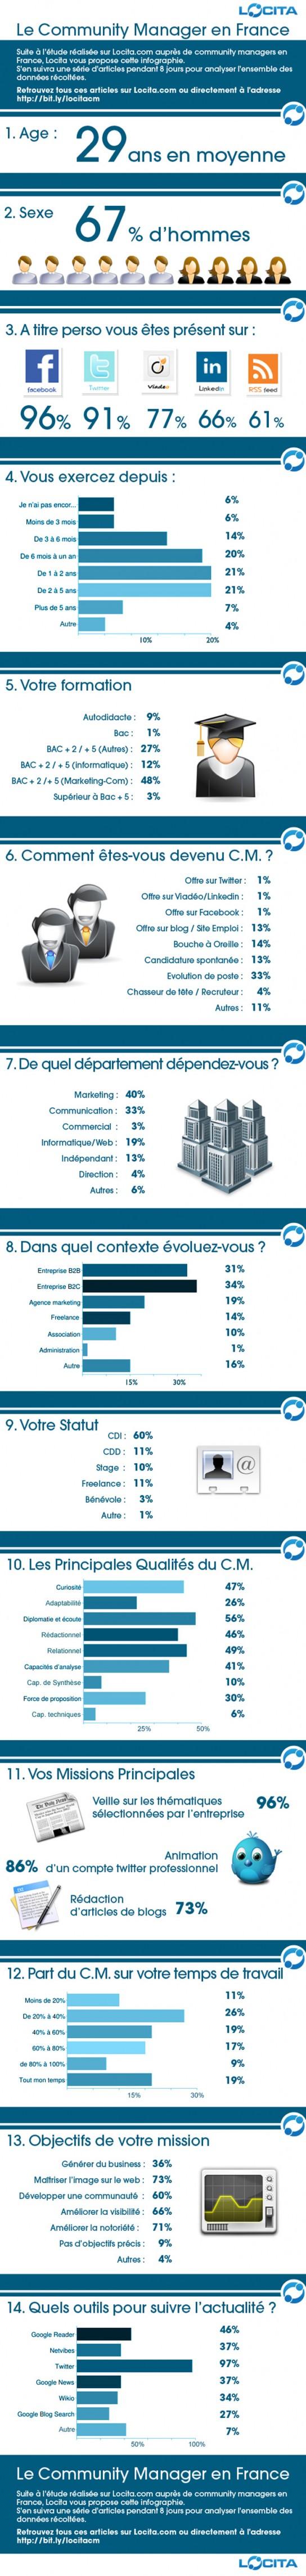 Le profil du community manager en France